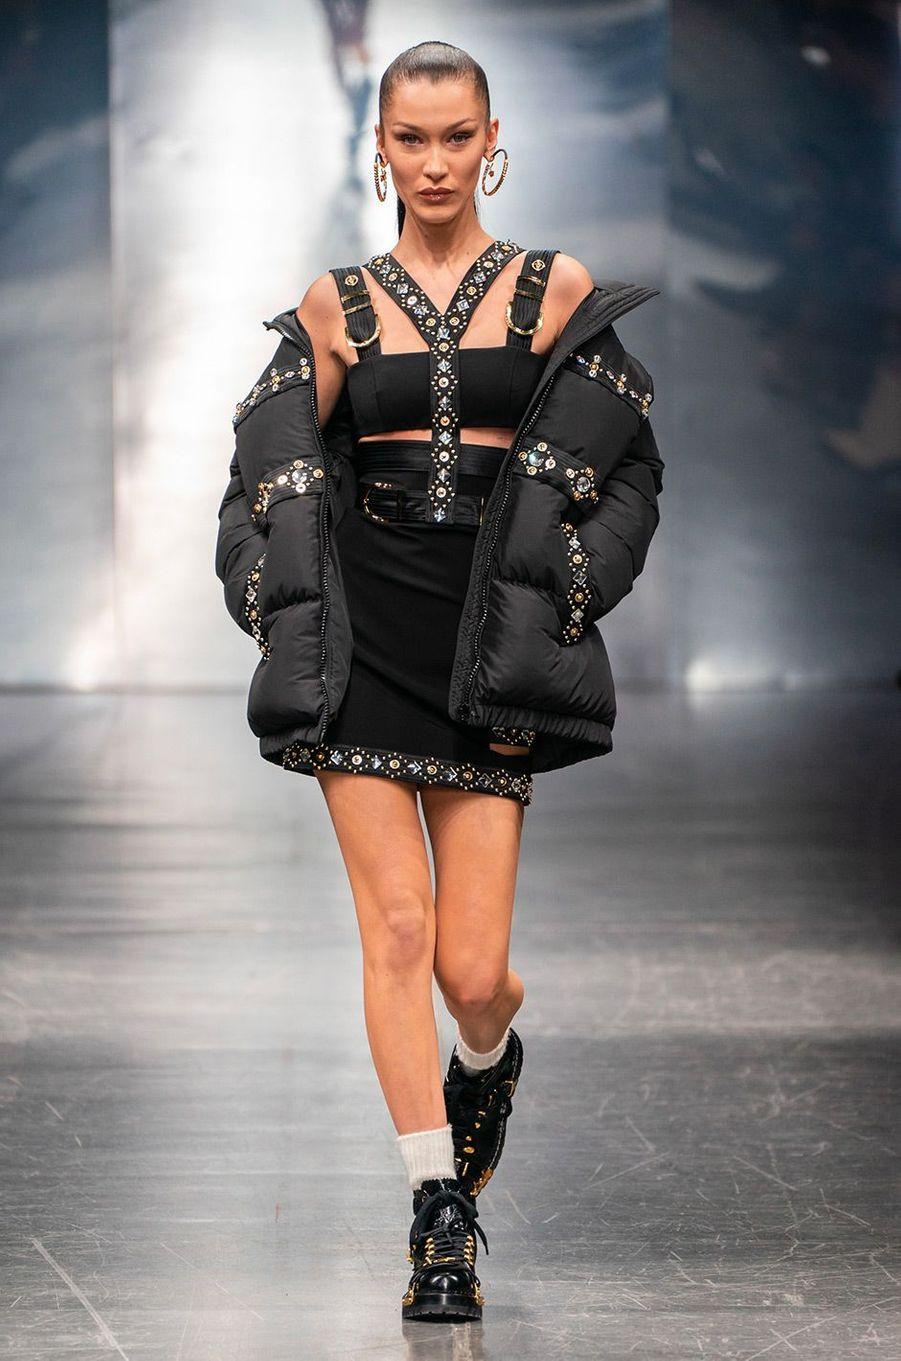 Bella Hadid au défilé Versace à Milan, samedi 12 janvier